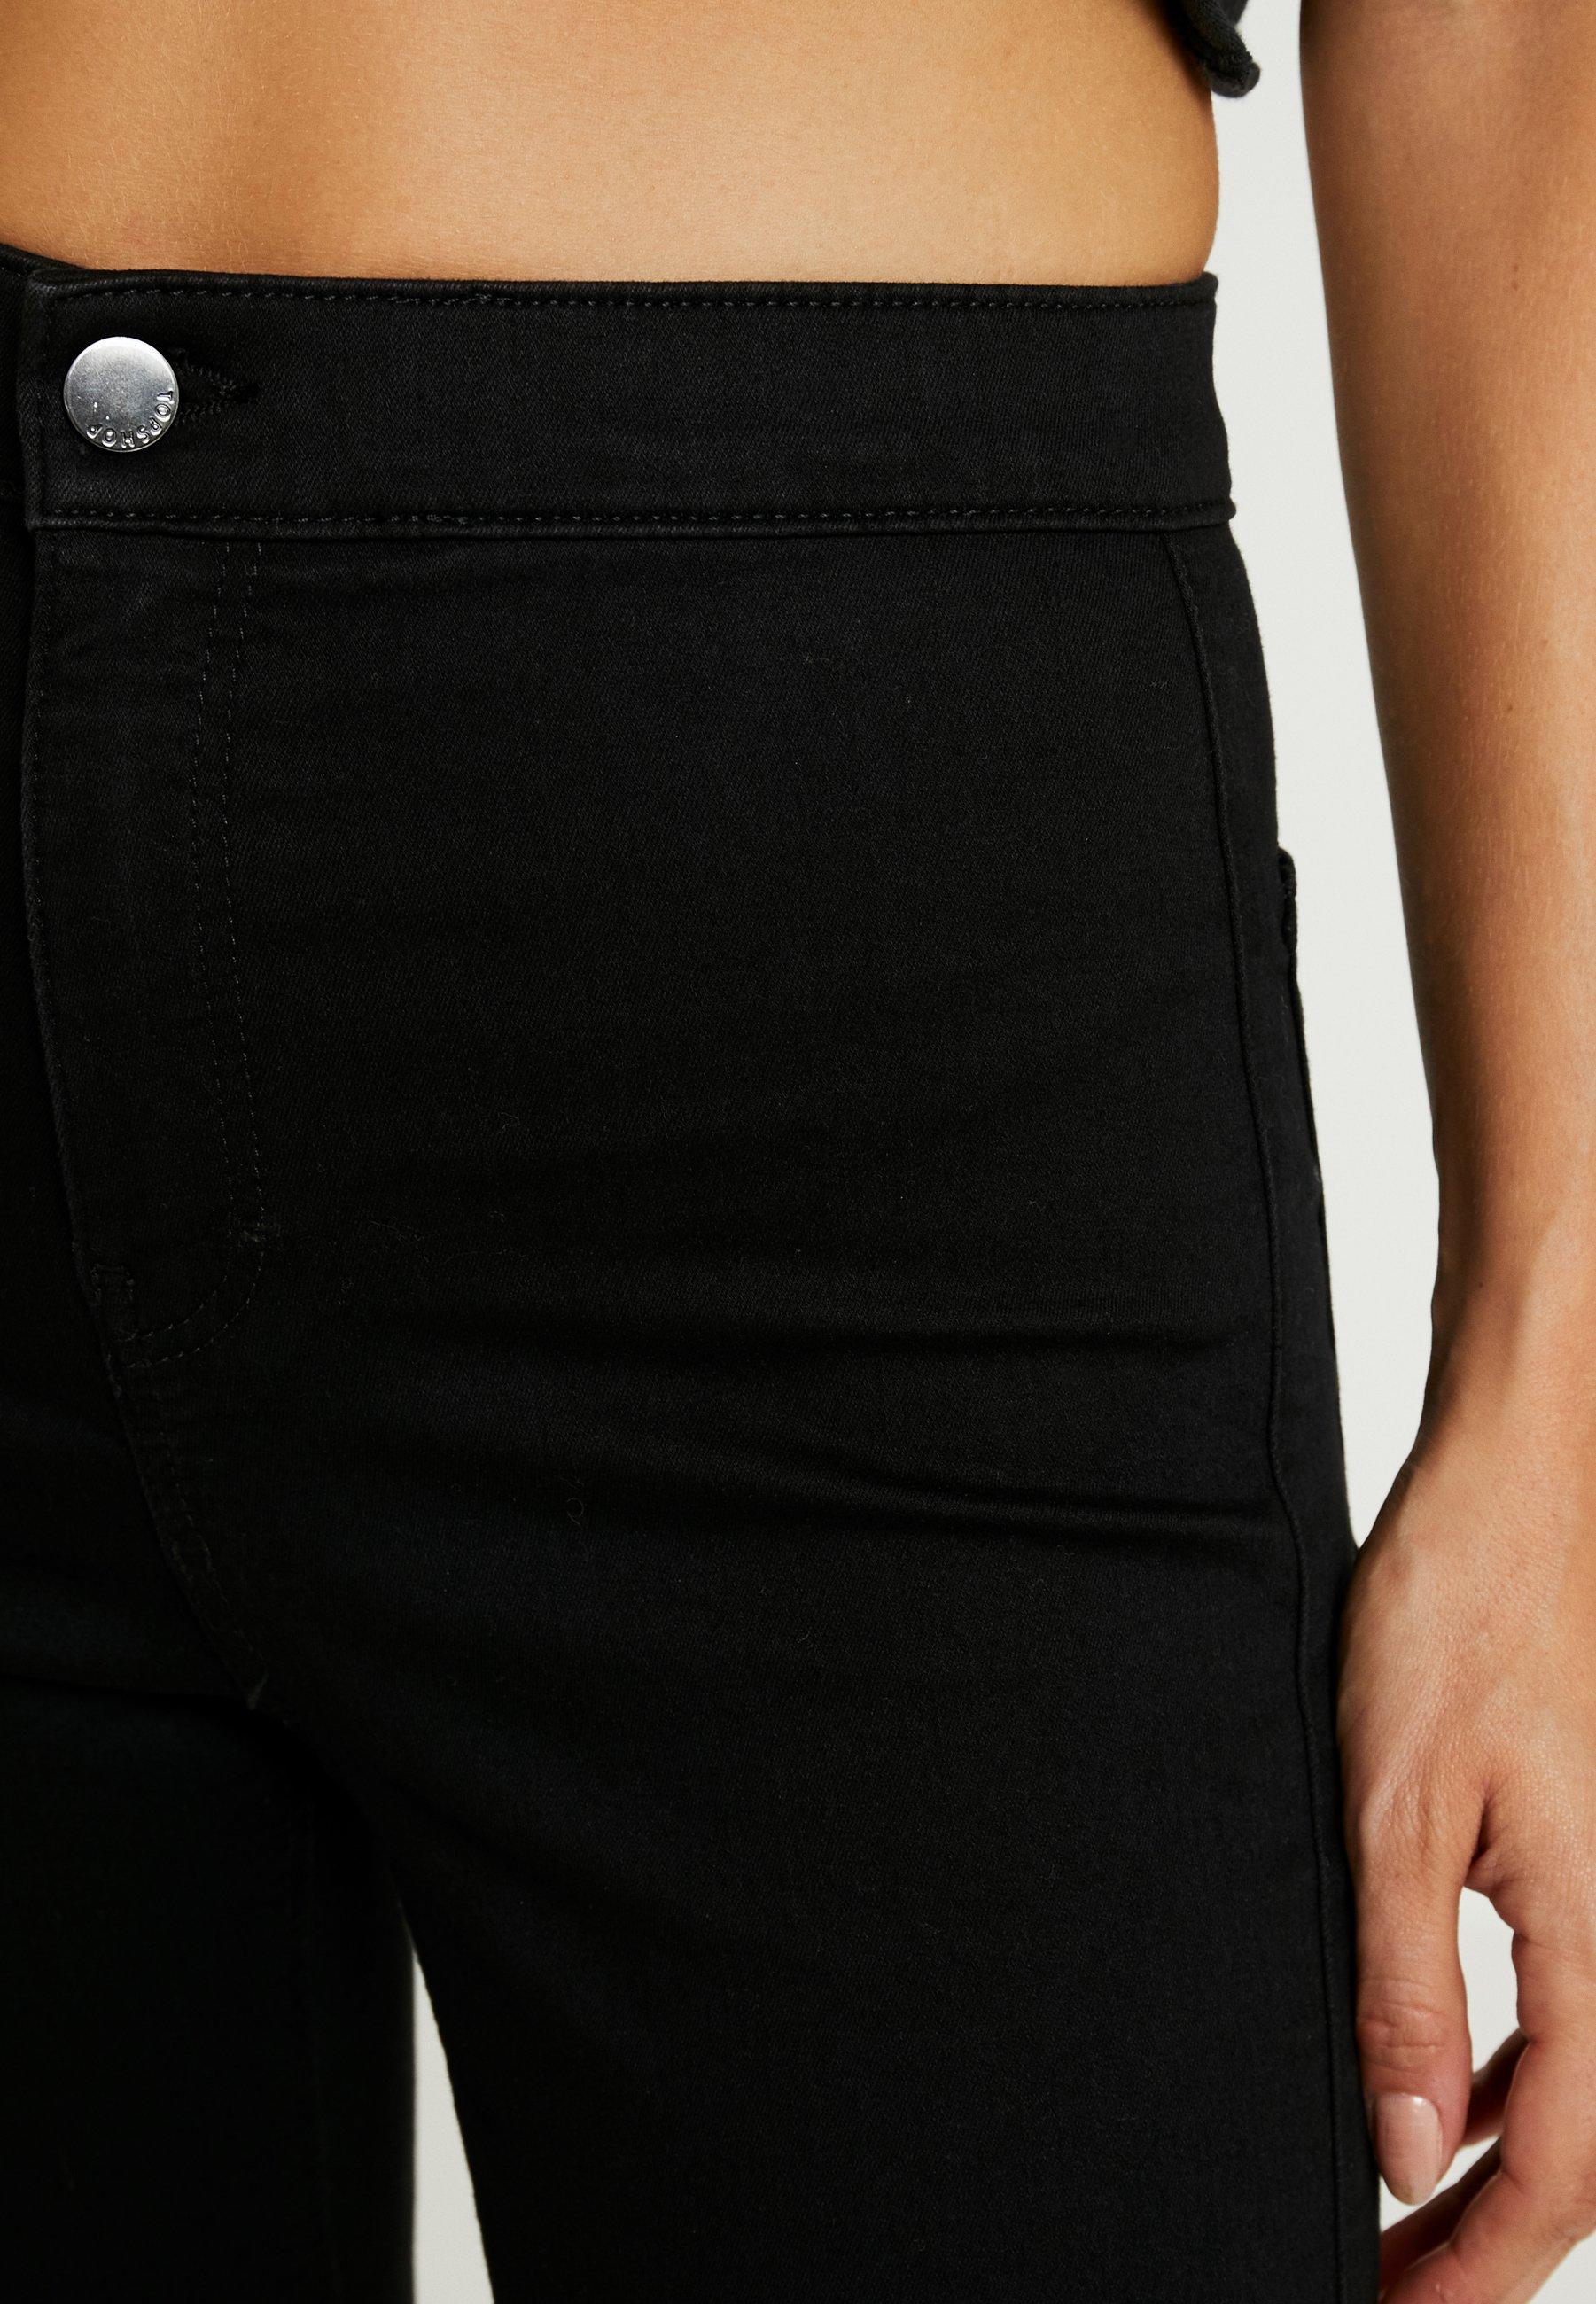 Topshop Petite Joni Clean - Jeans Skinny Fit Black